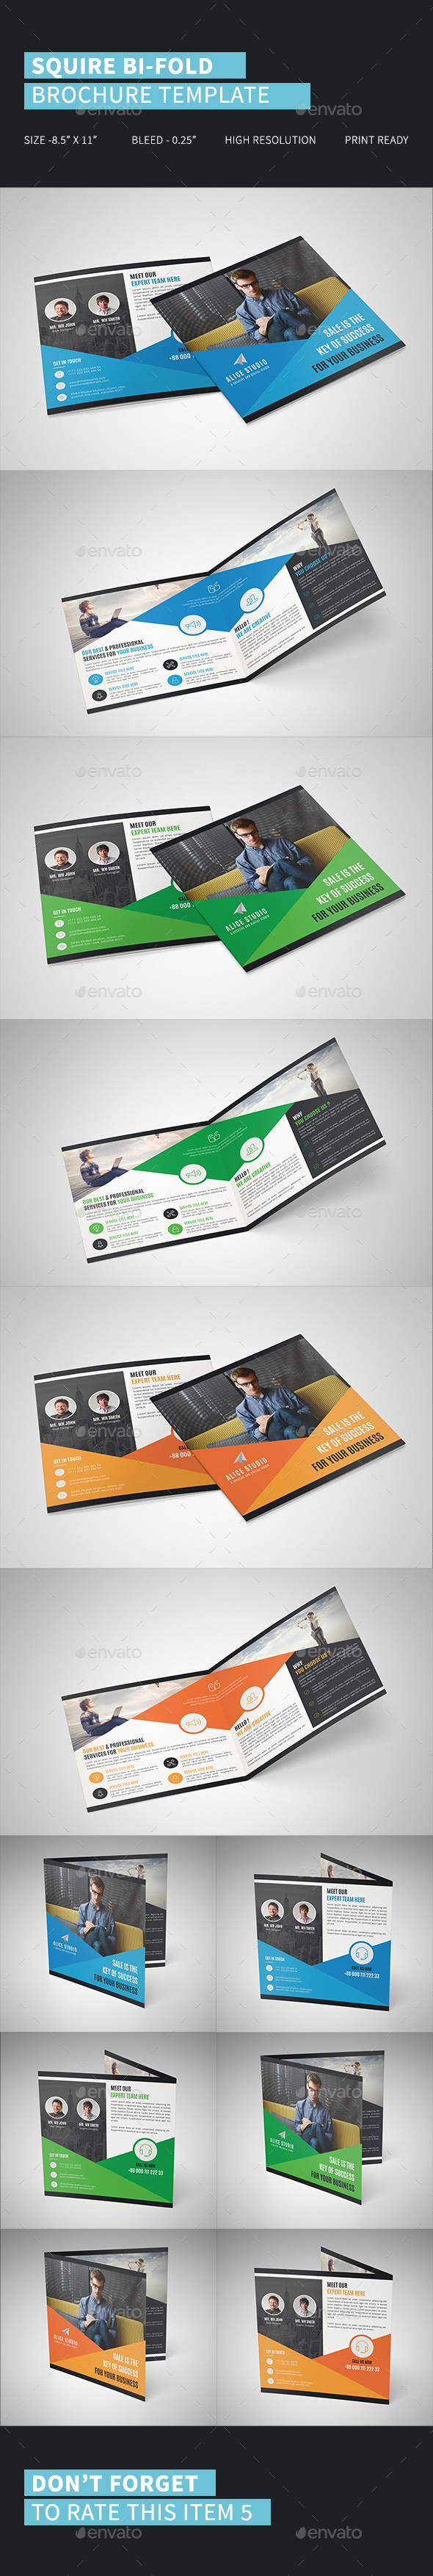 Squire Bi-Fold Brochure Template - Brochures Print Templates